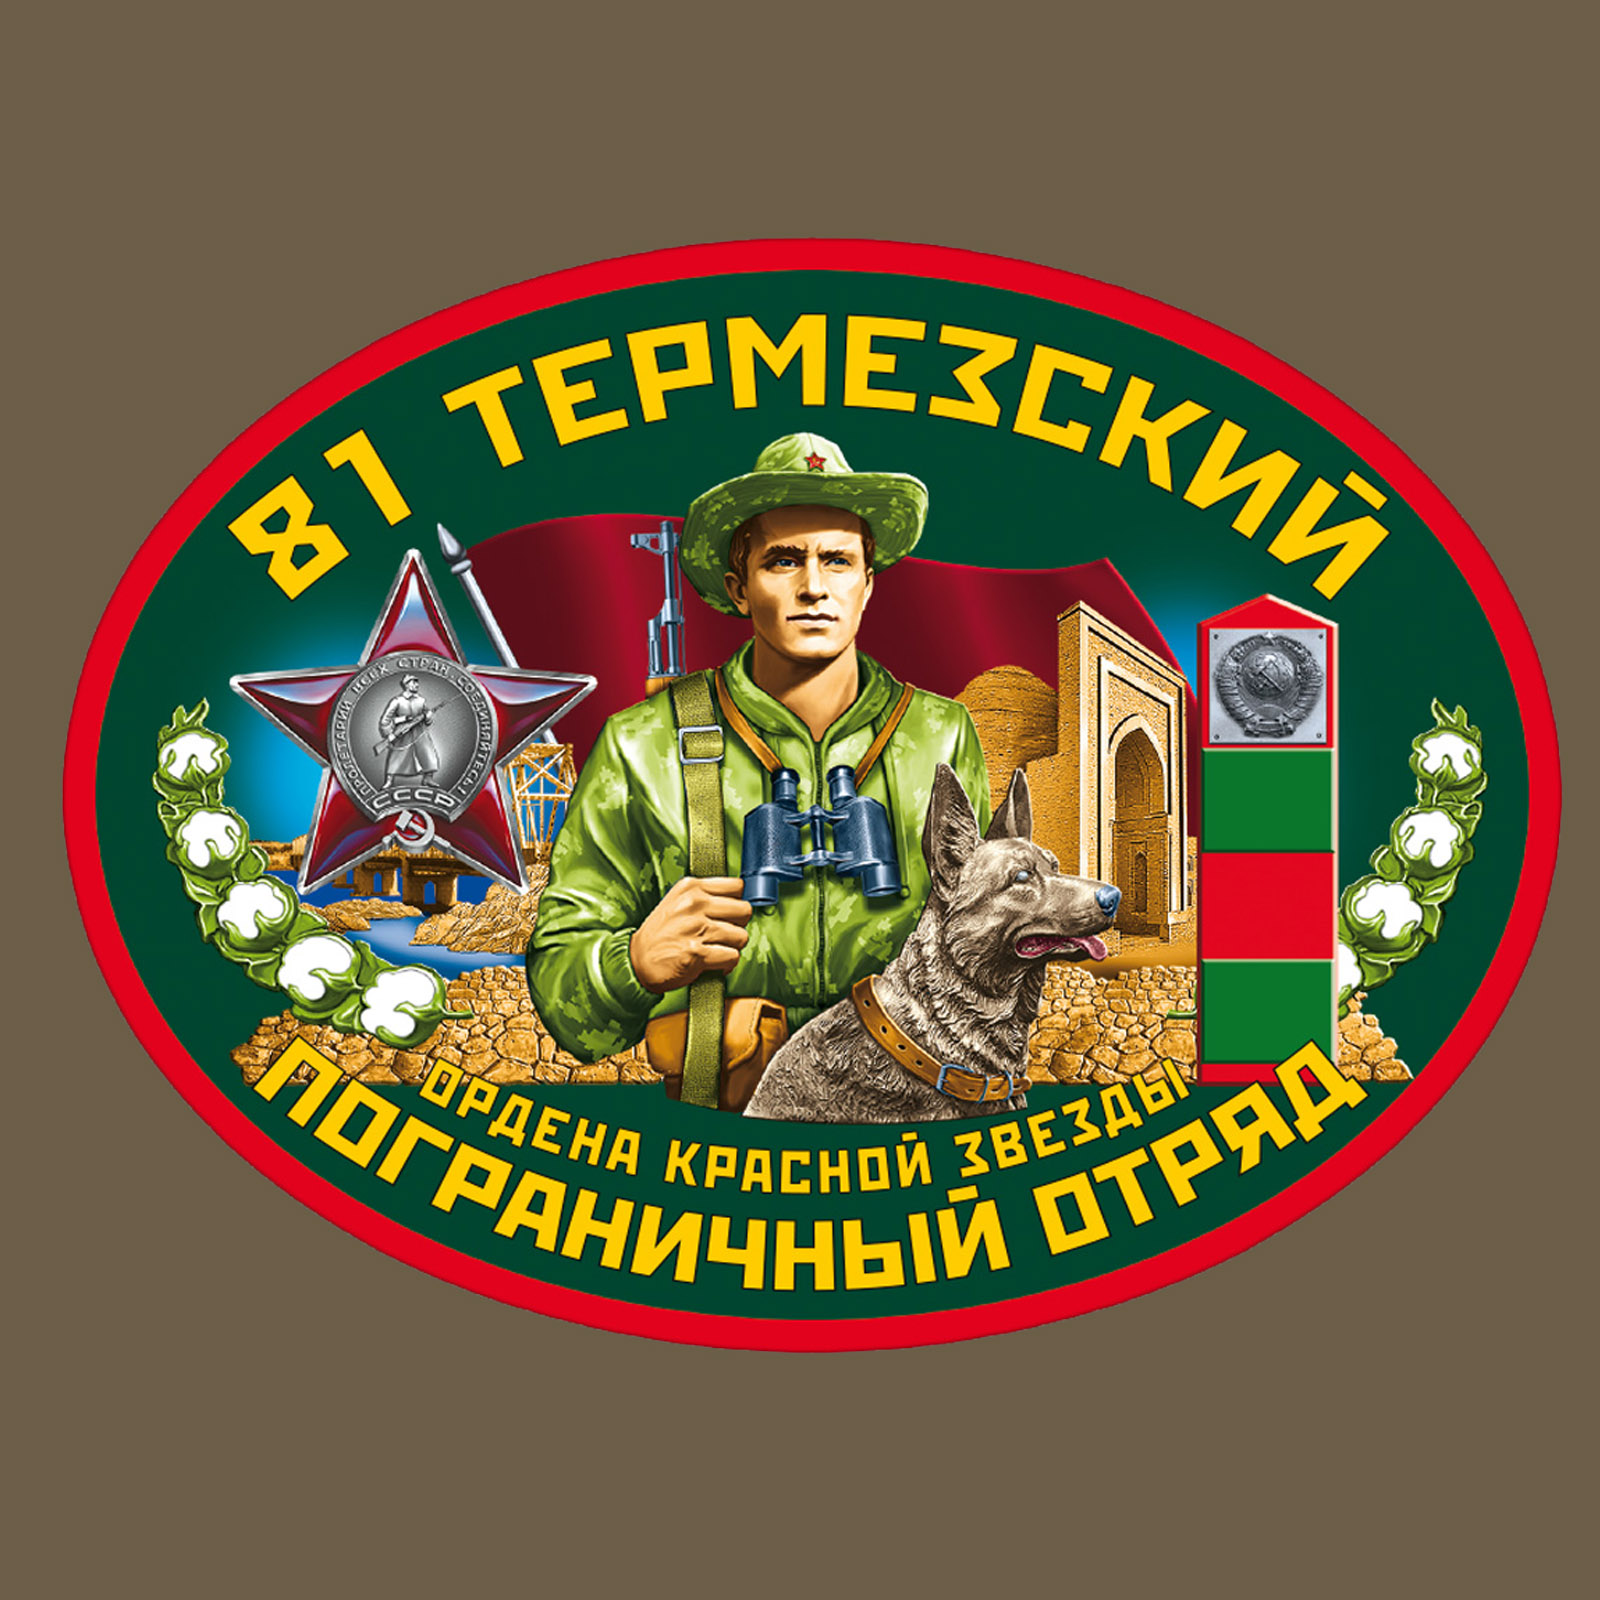 Оливковое поло 81 Термезского погранотряда